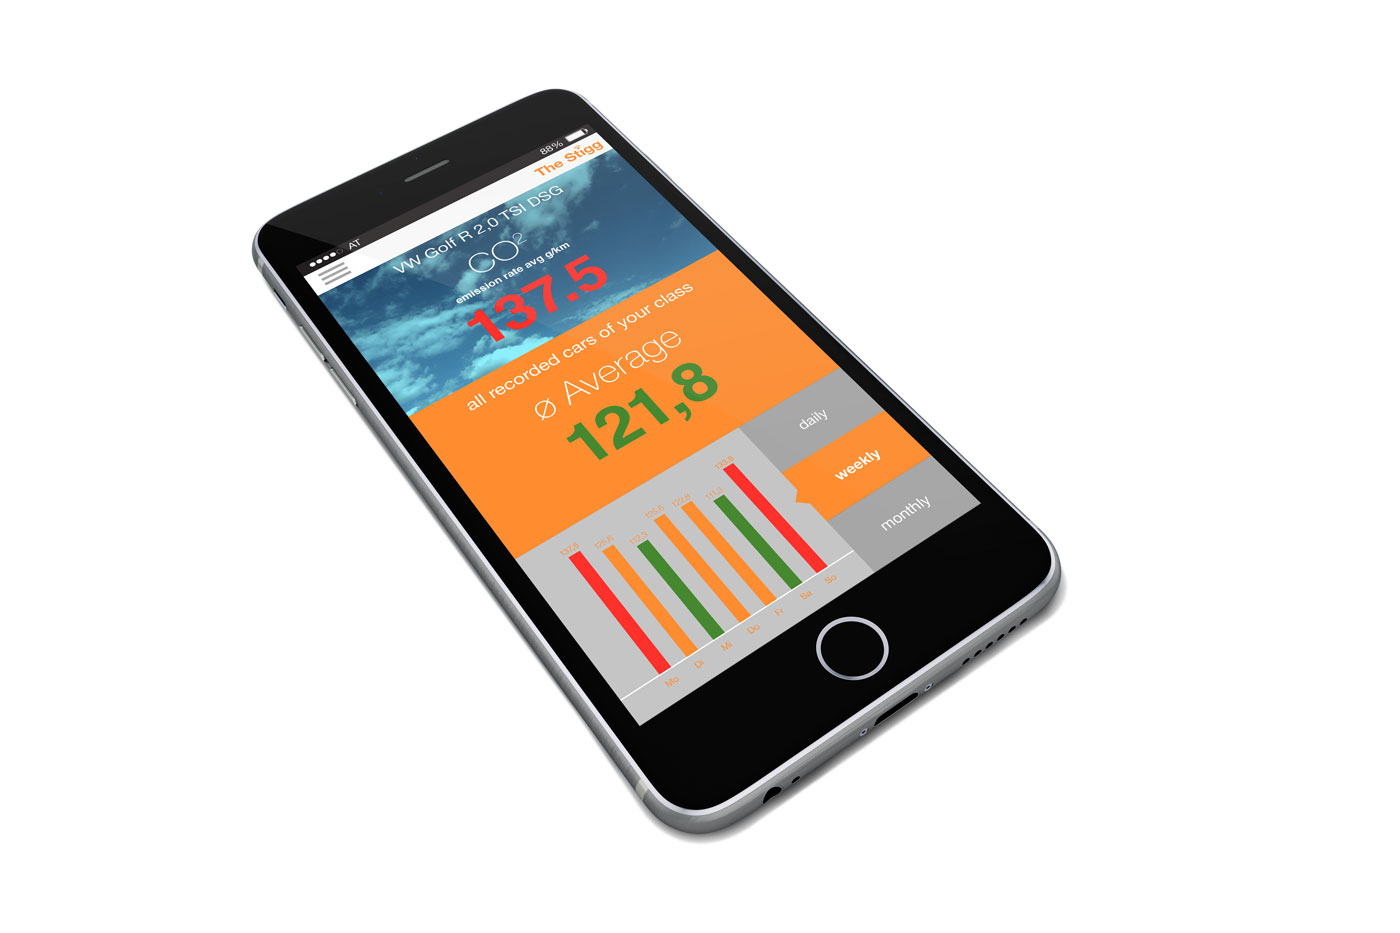 smarte-apps-5_the-stigg_designkitchen.jpg